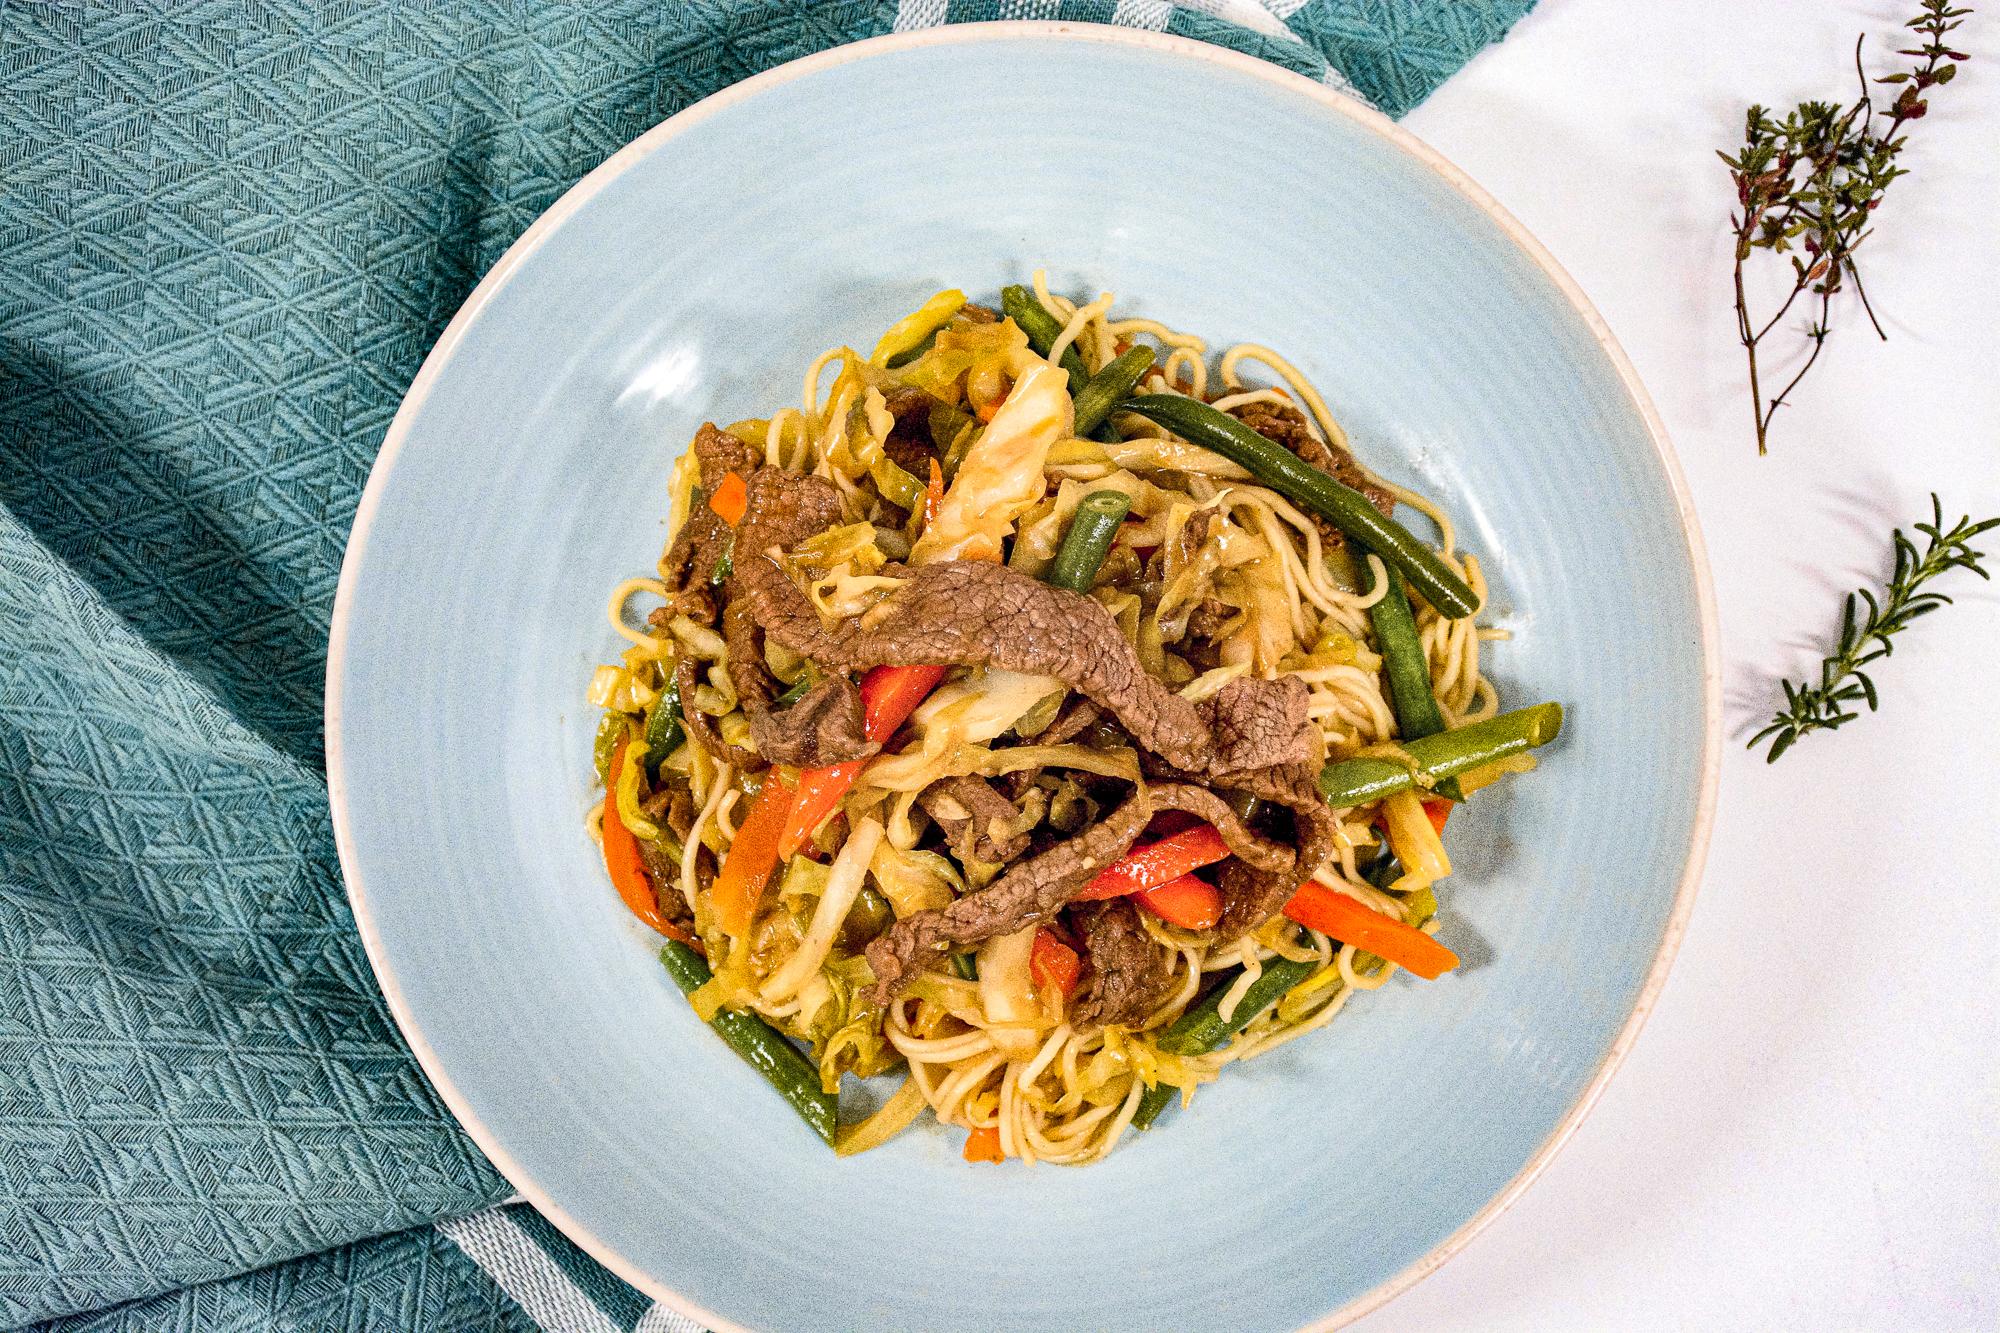 Teriyaki Beef with noodles